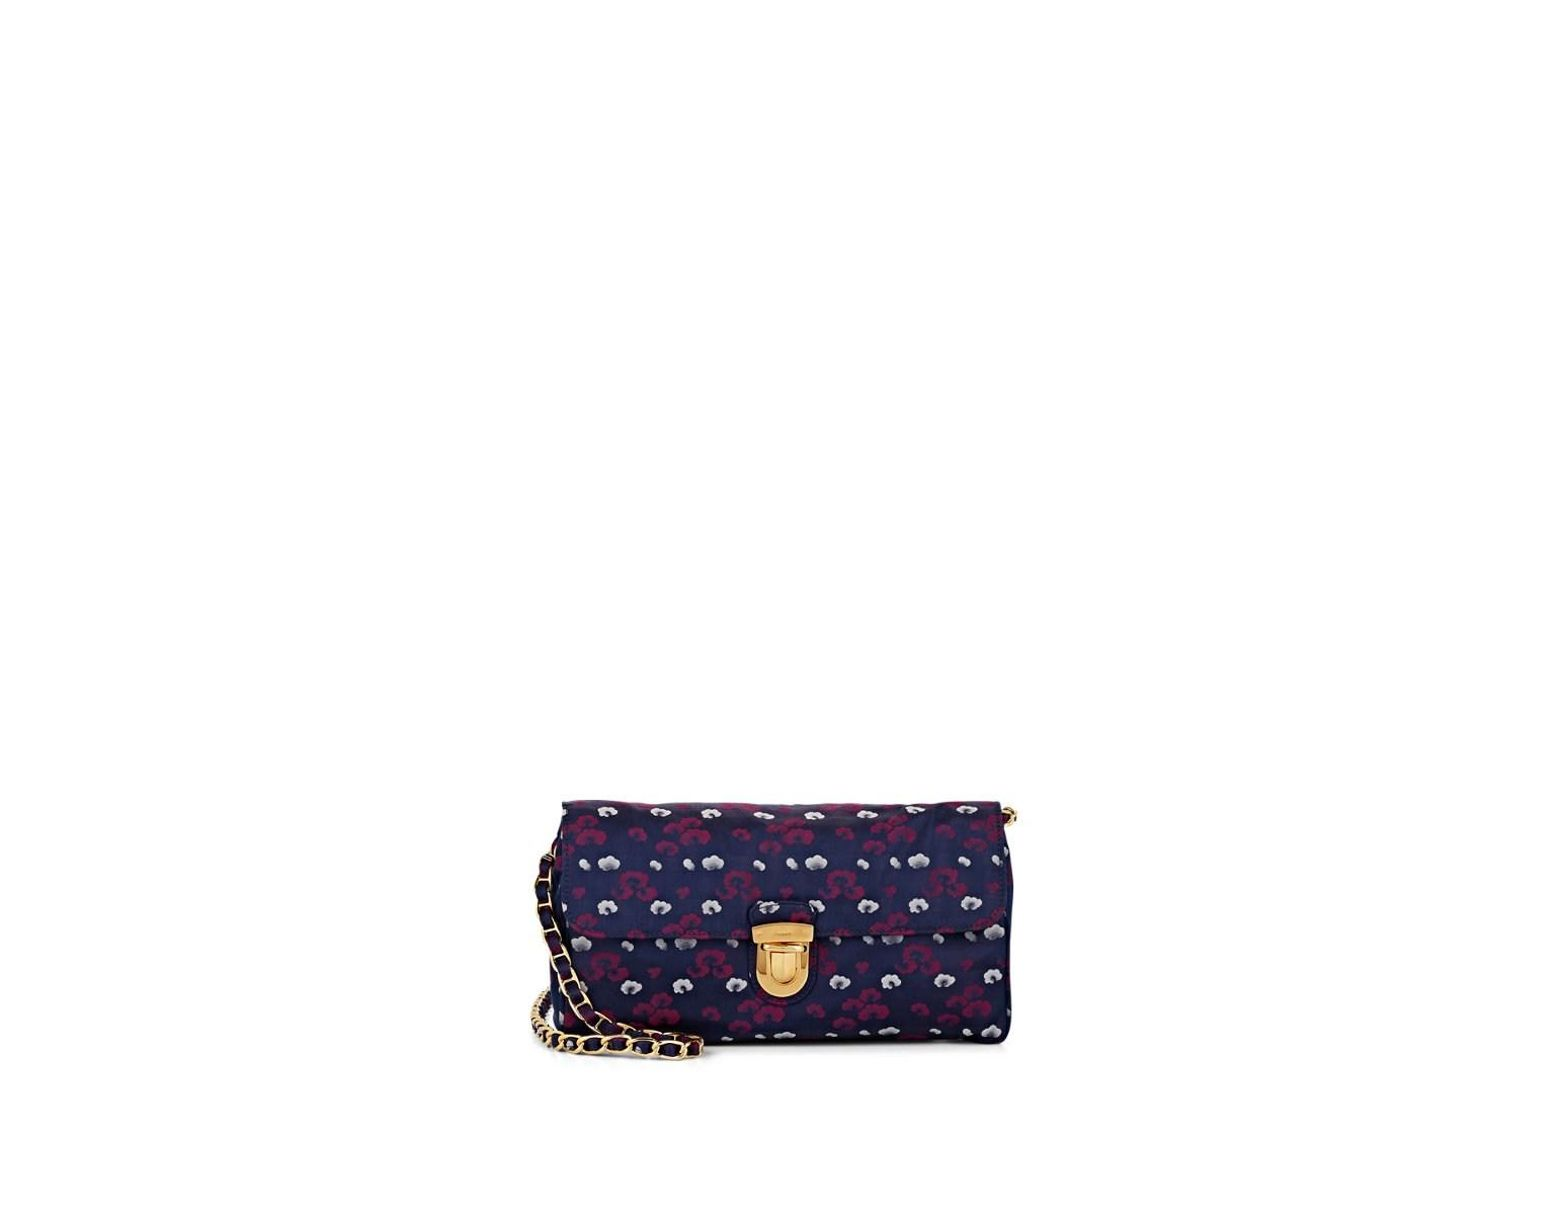 0789c5617dd Prada Donna Floral Print Shoulder Bag in Purple - Save 50% - Lyst